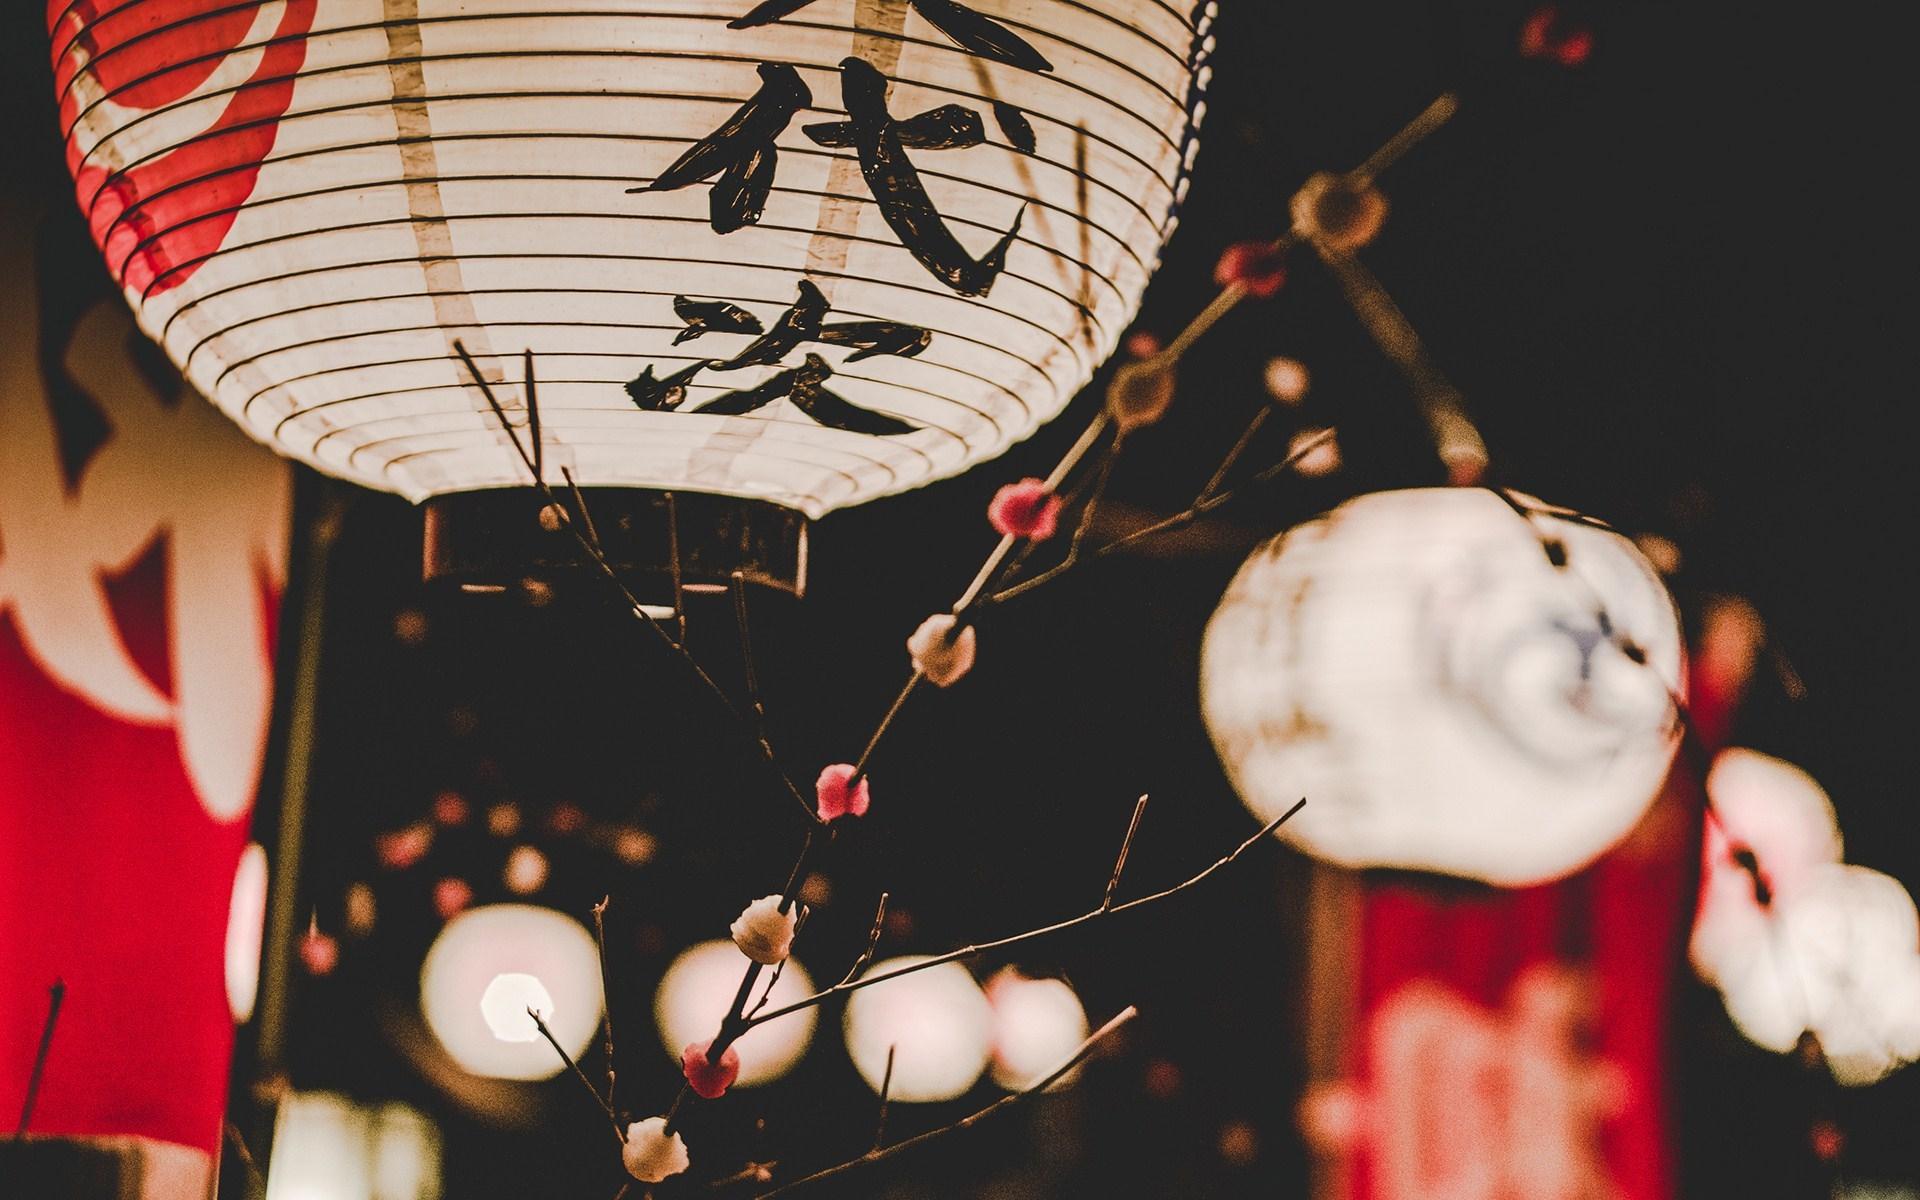 Asian Oriental Lanterns Paper Lights Holiday Photo